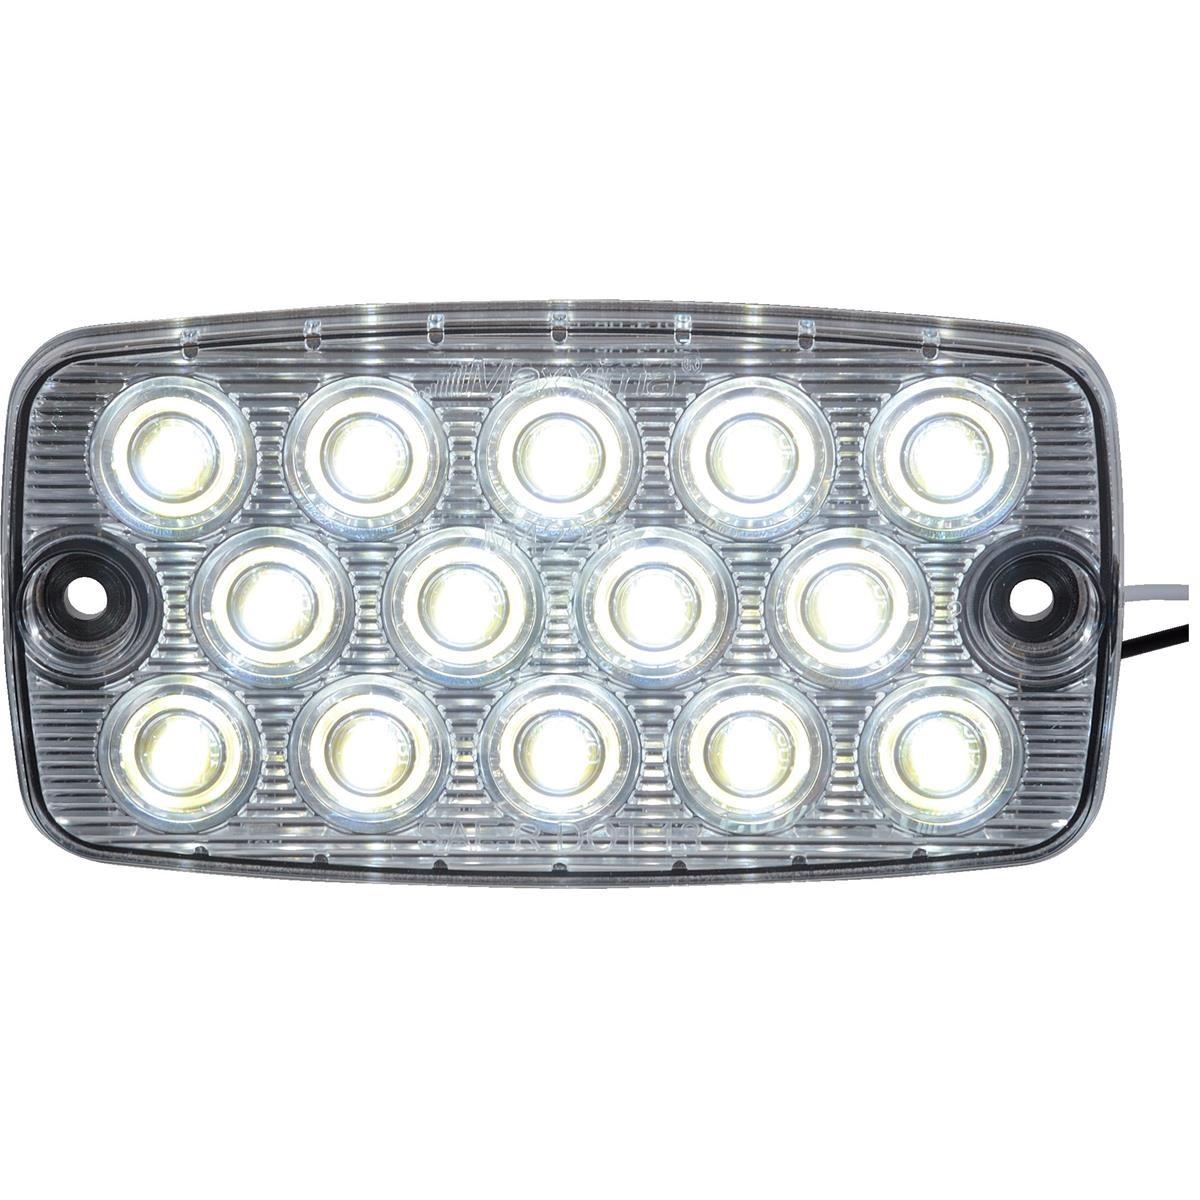 "MAXXIMA LED Low Profile Courtesy Light White 4 1 2""L x 2 1 2""W x 1""D"